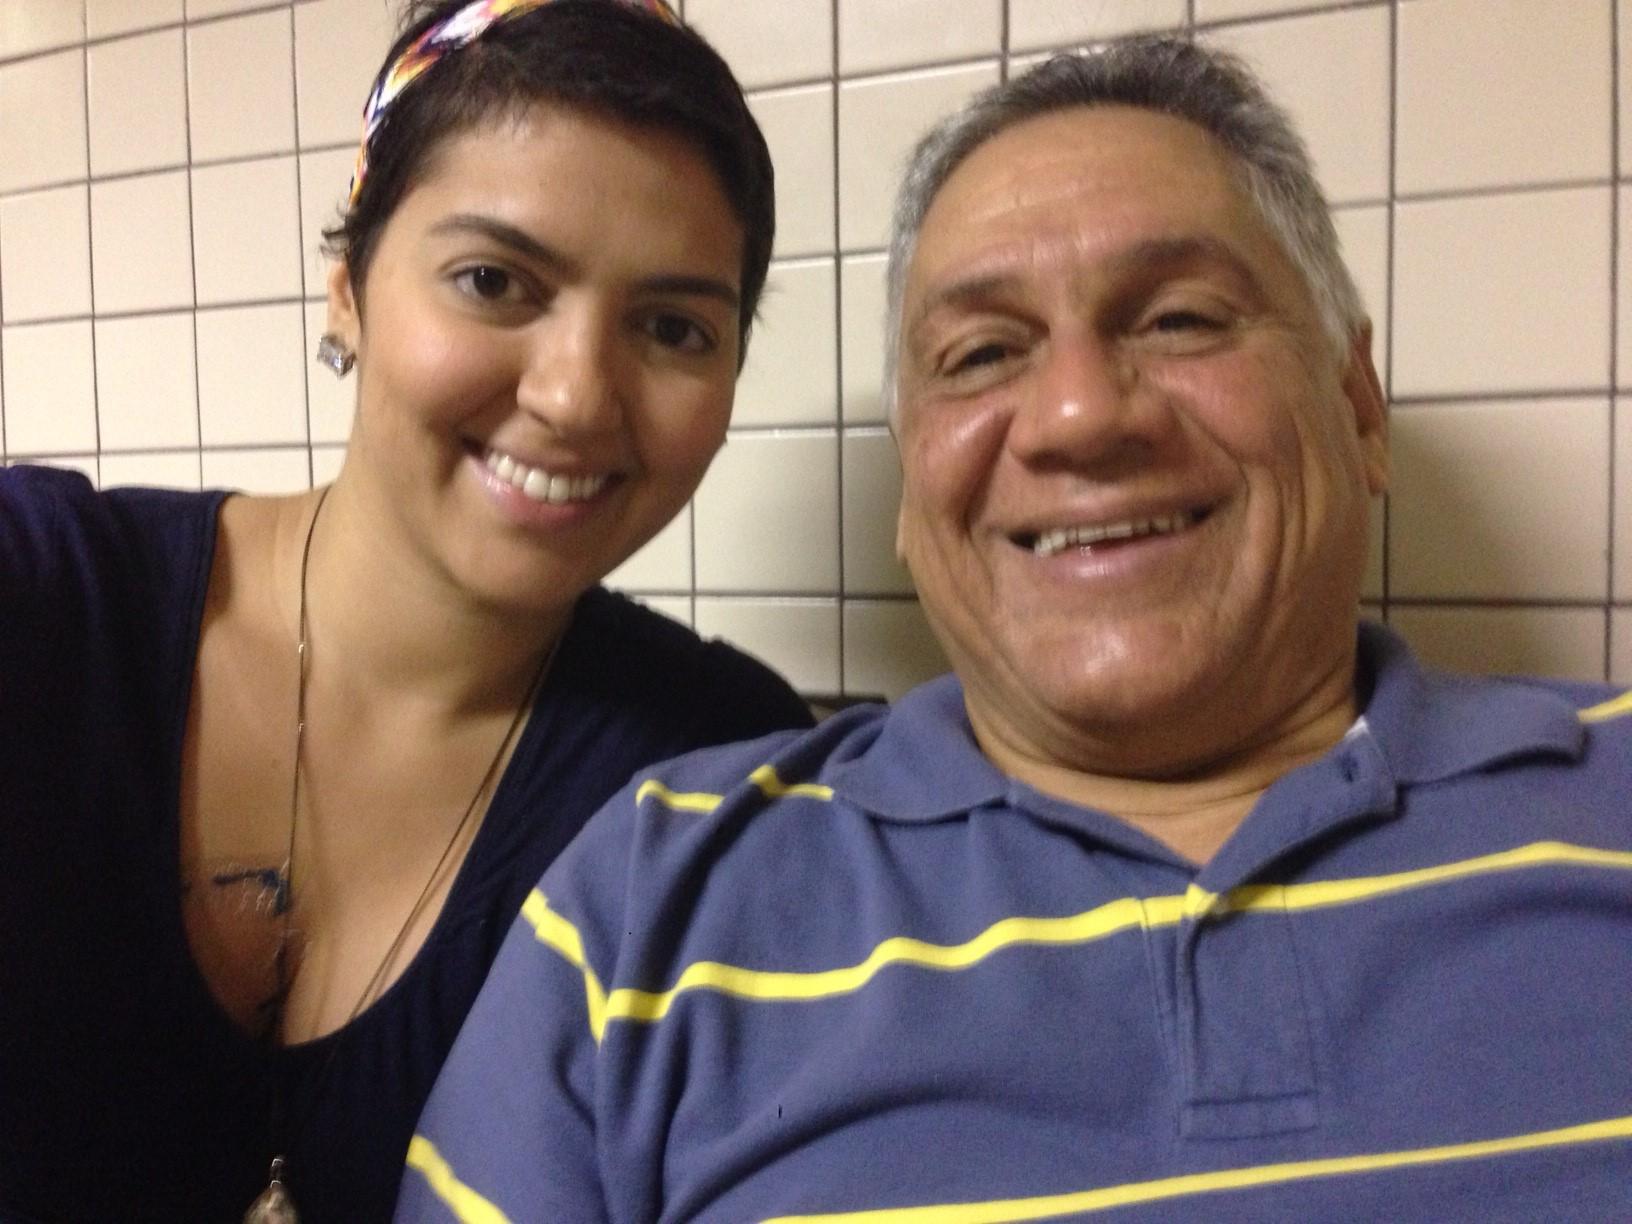 Eu e meu pai na radioterapia